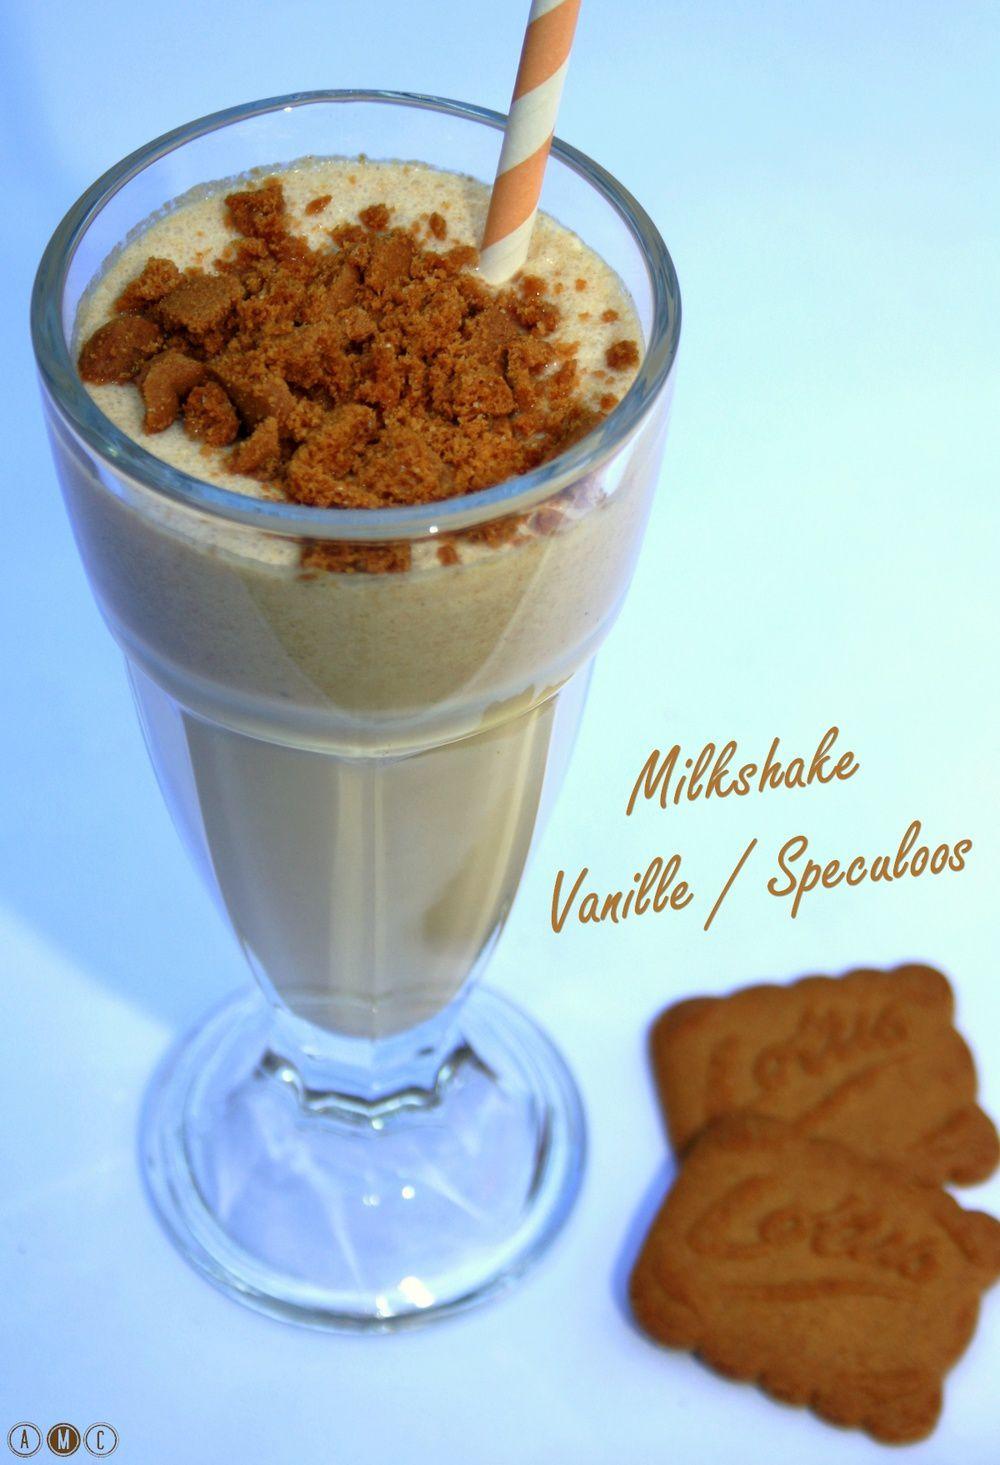 Milkshake vanille et spéculoos